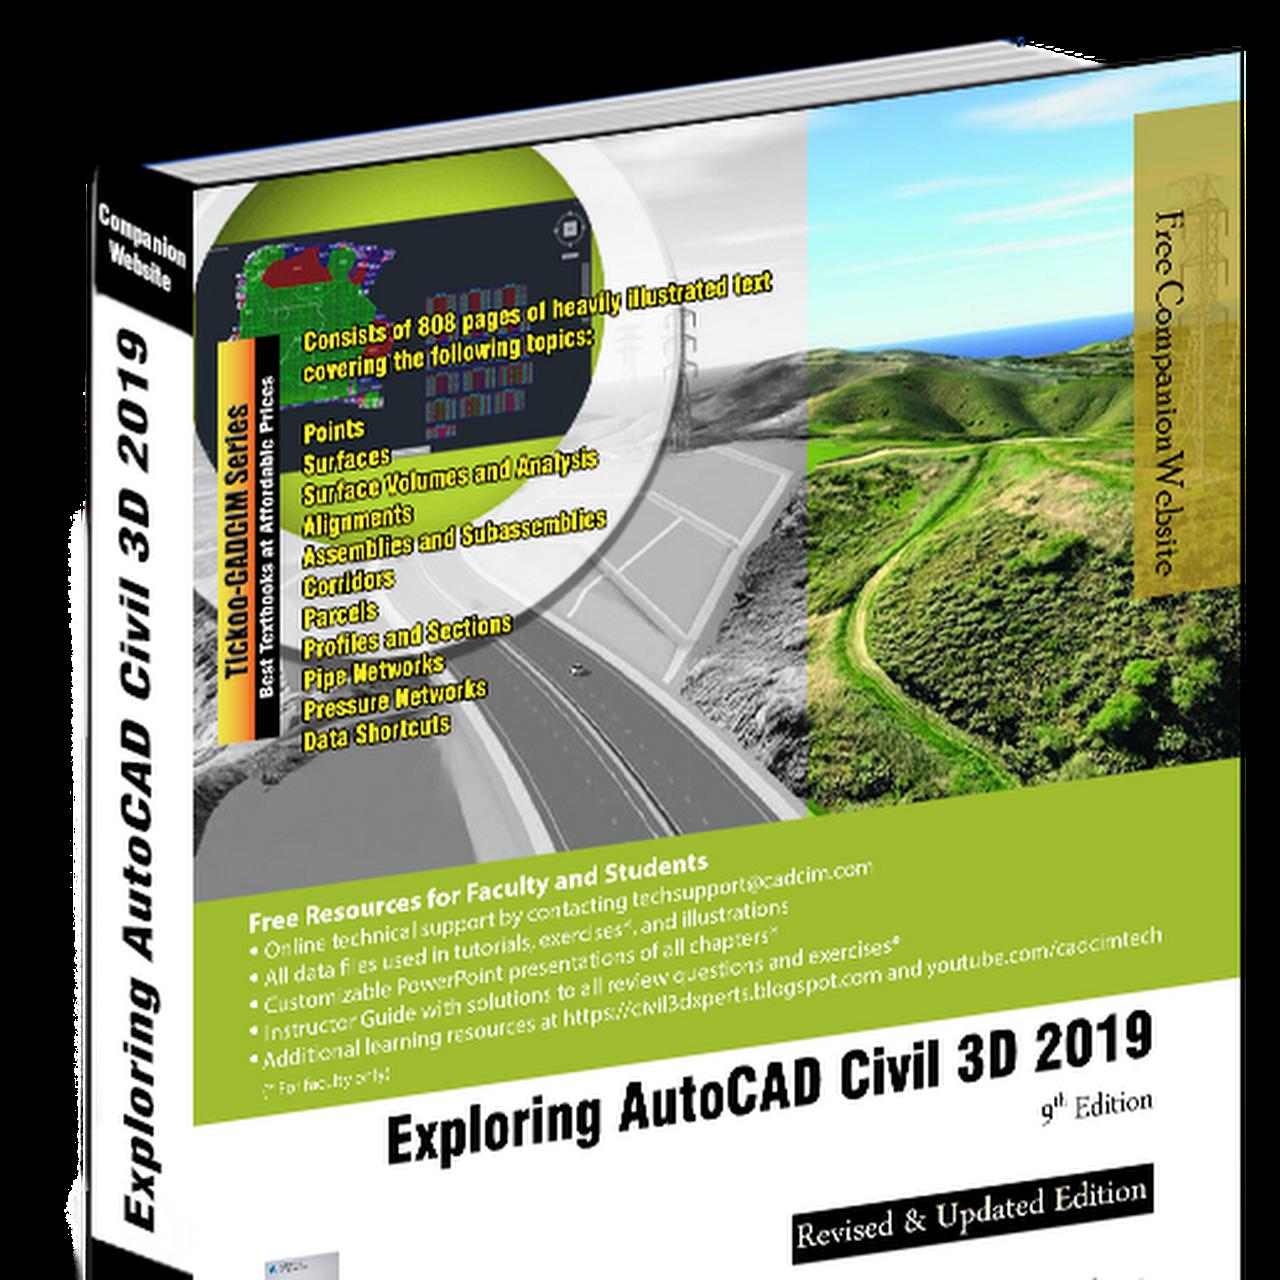 CADCIM Technologies - Book Publisher in Schererville Indiana USA